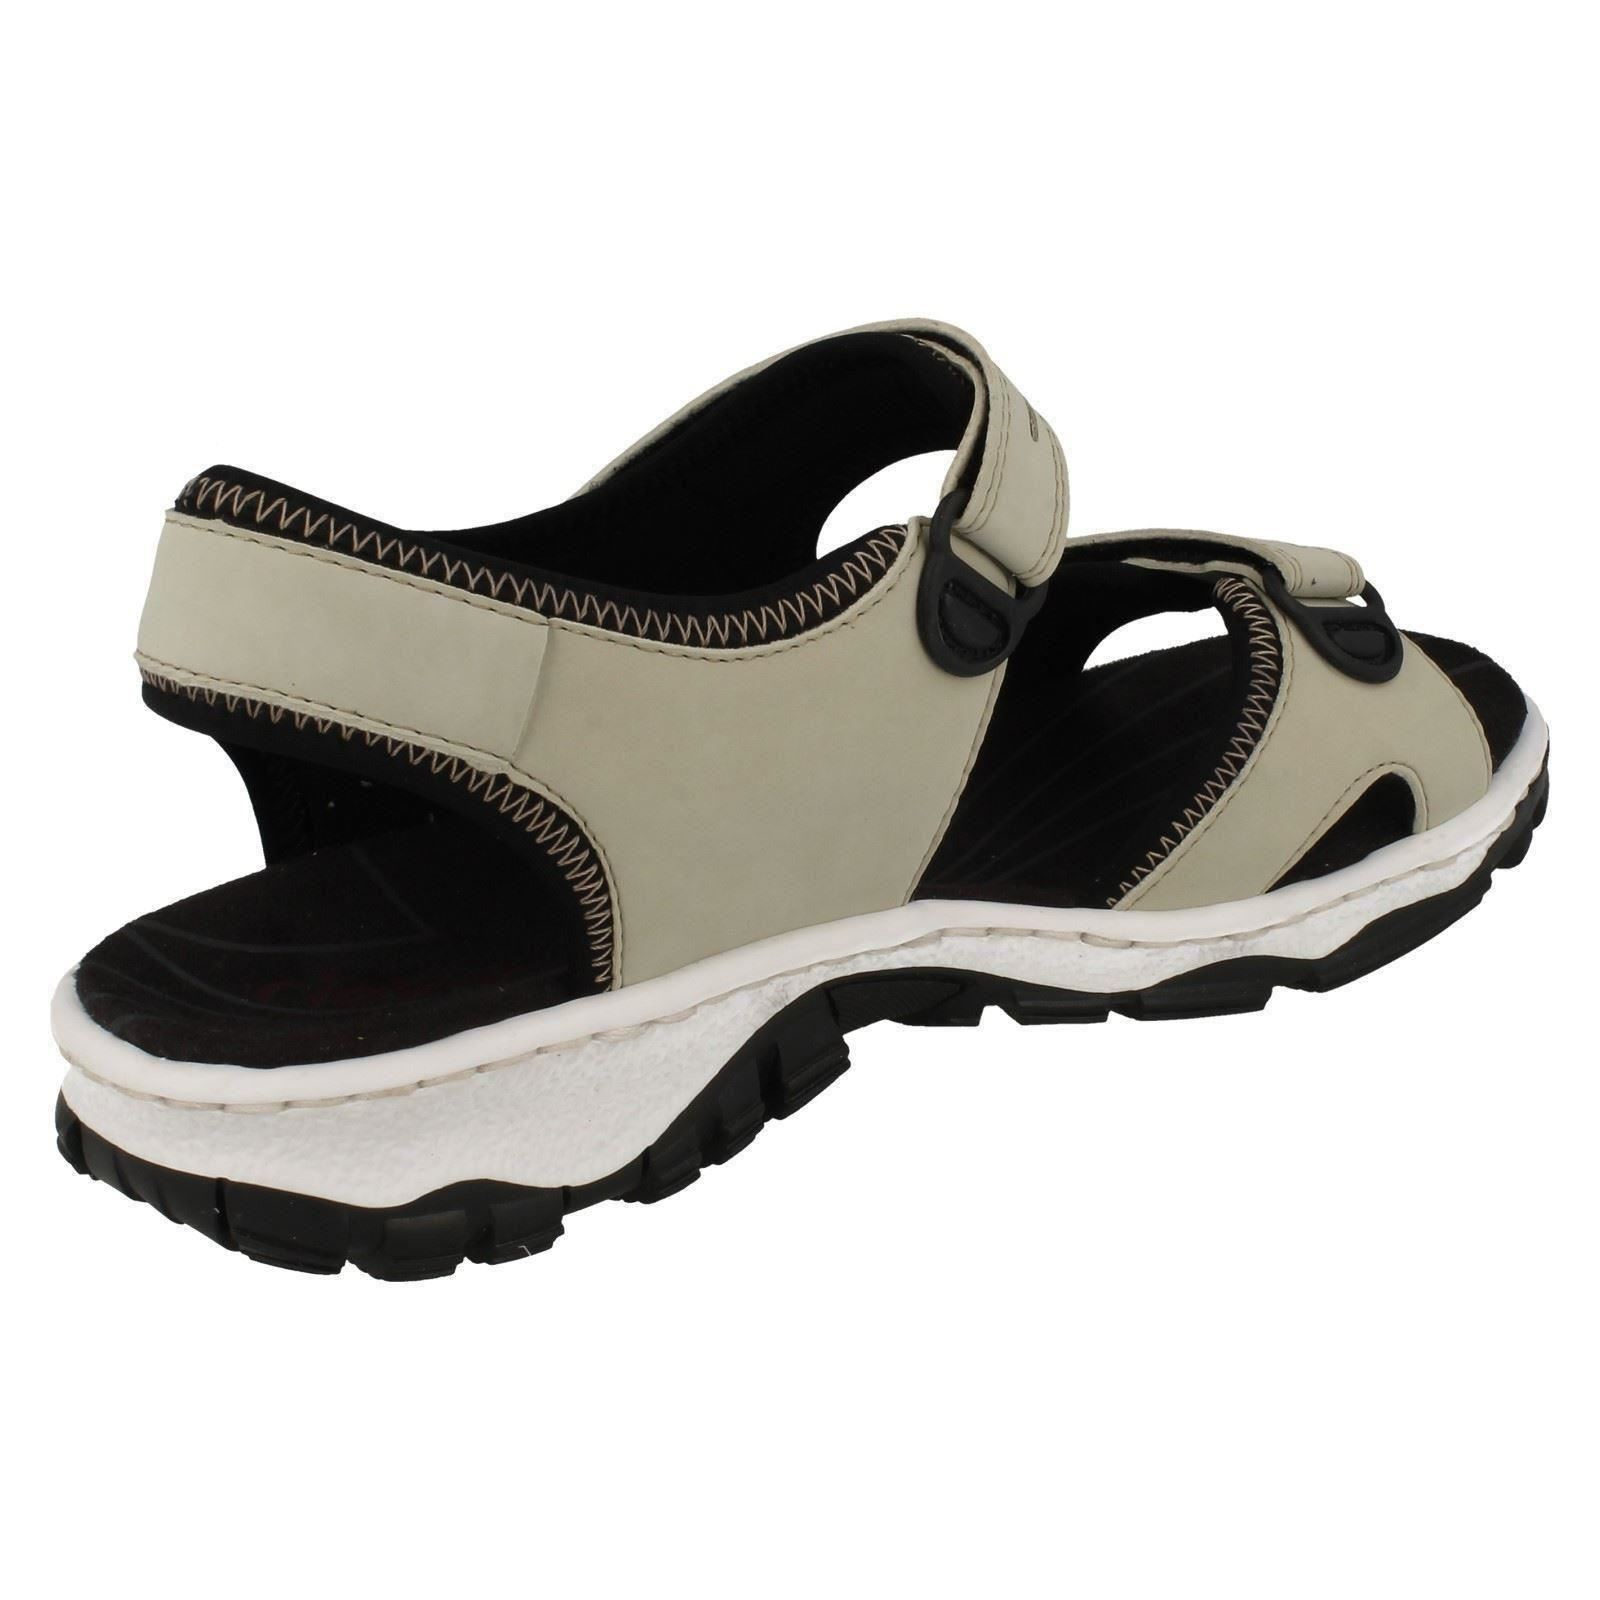 Rieker Ladies Summer Shoes